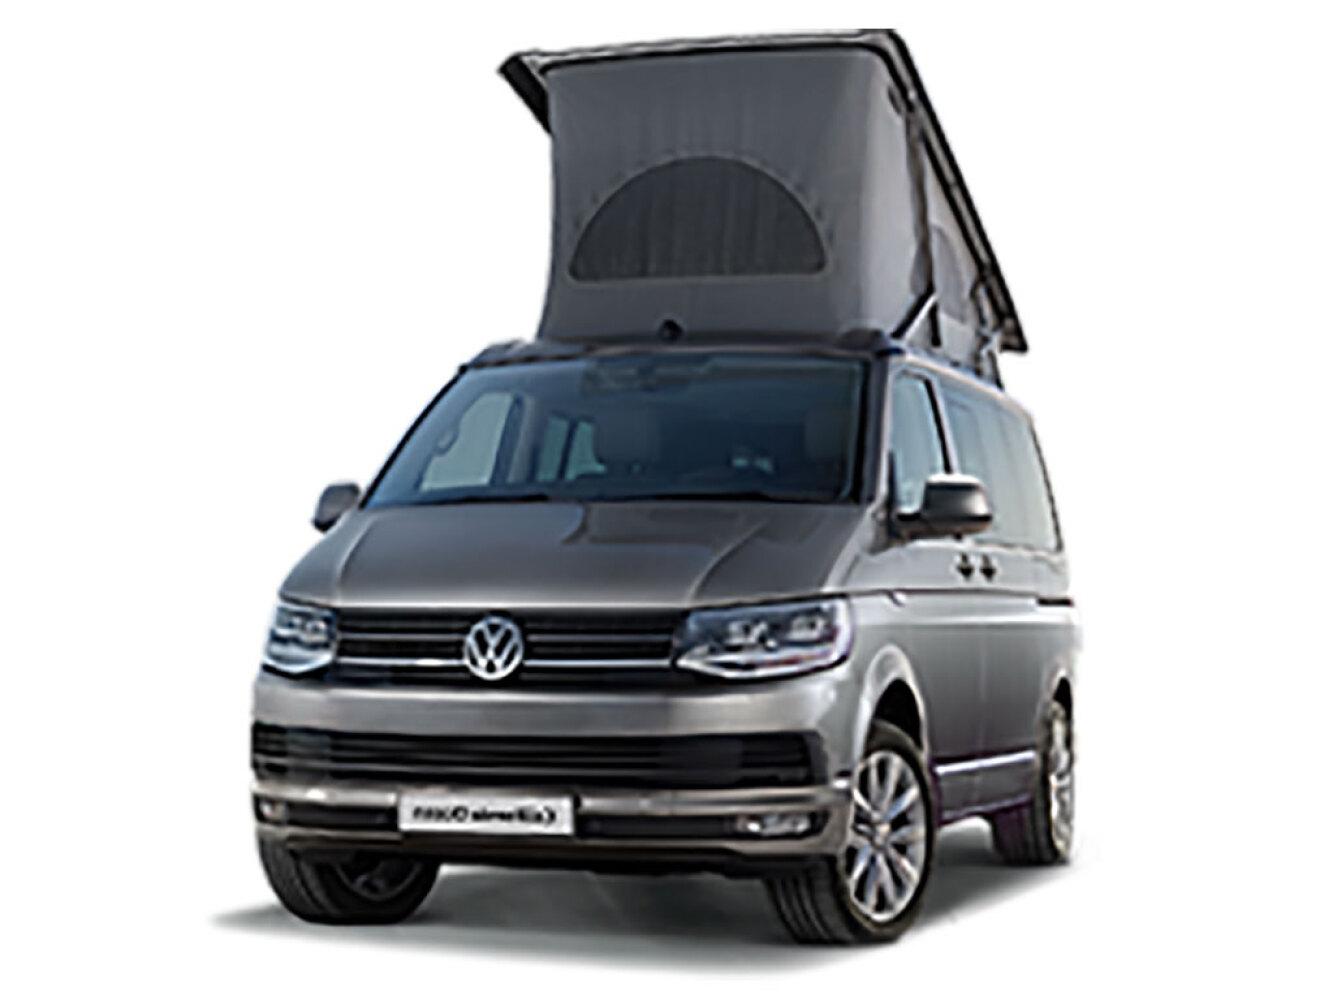 6c20be0c9f5816 Volkswagen California 2.0 TDI BlueMotion Tech Ocean 204 5dr DSG Diesel  Estate